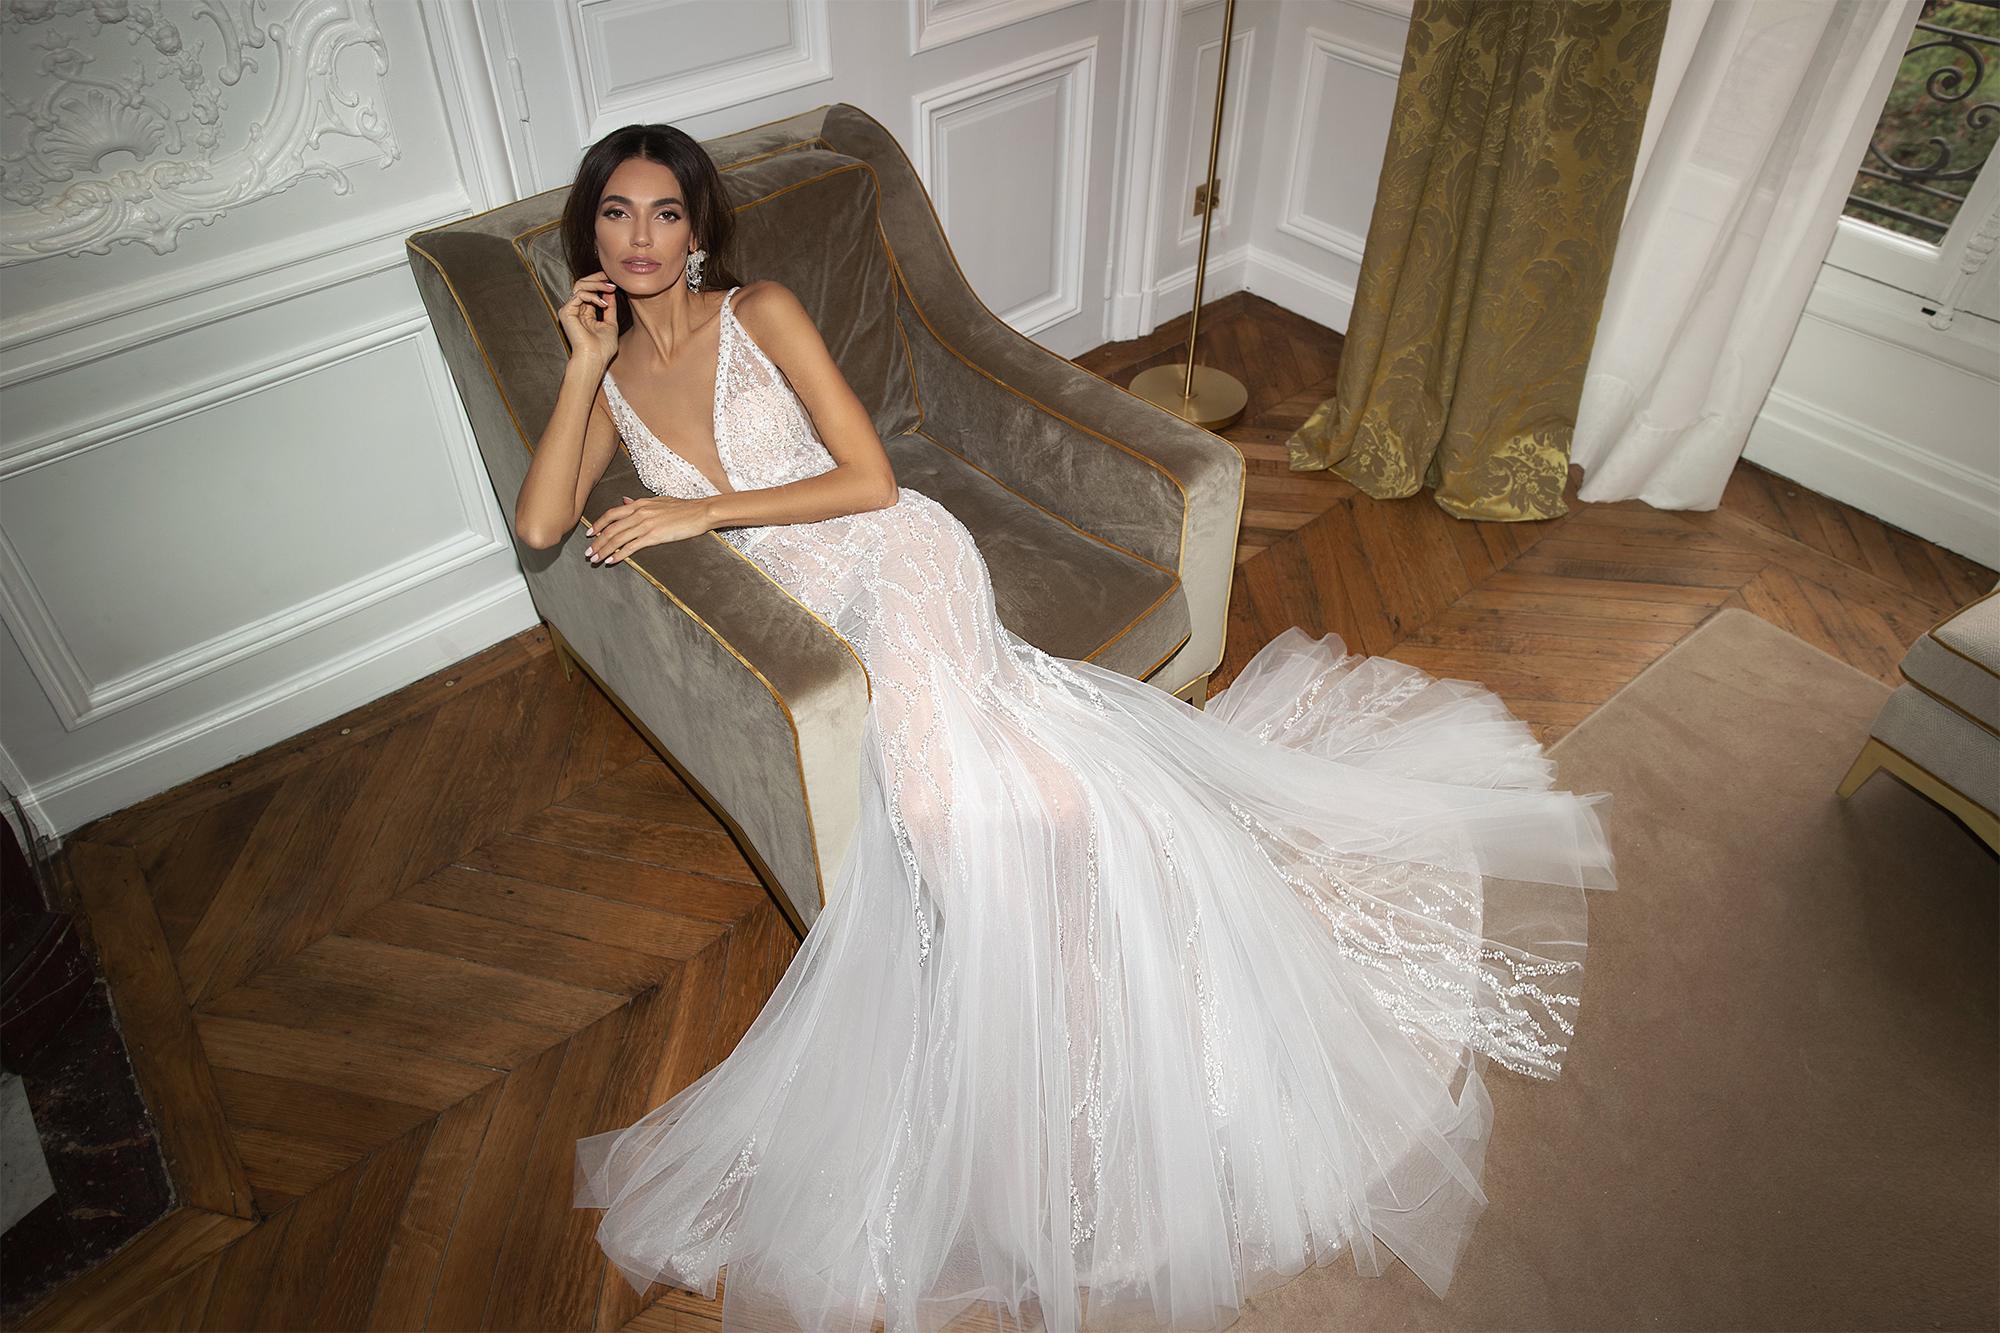 LuceSposa Paris Campaign - Margot